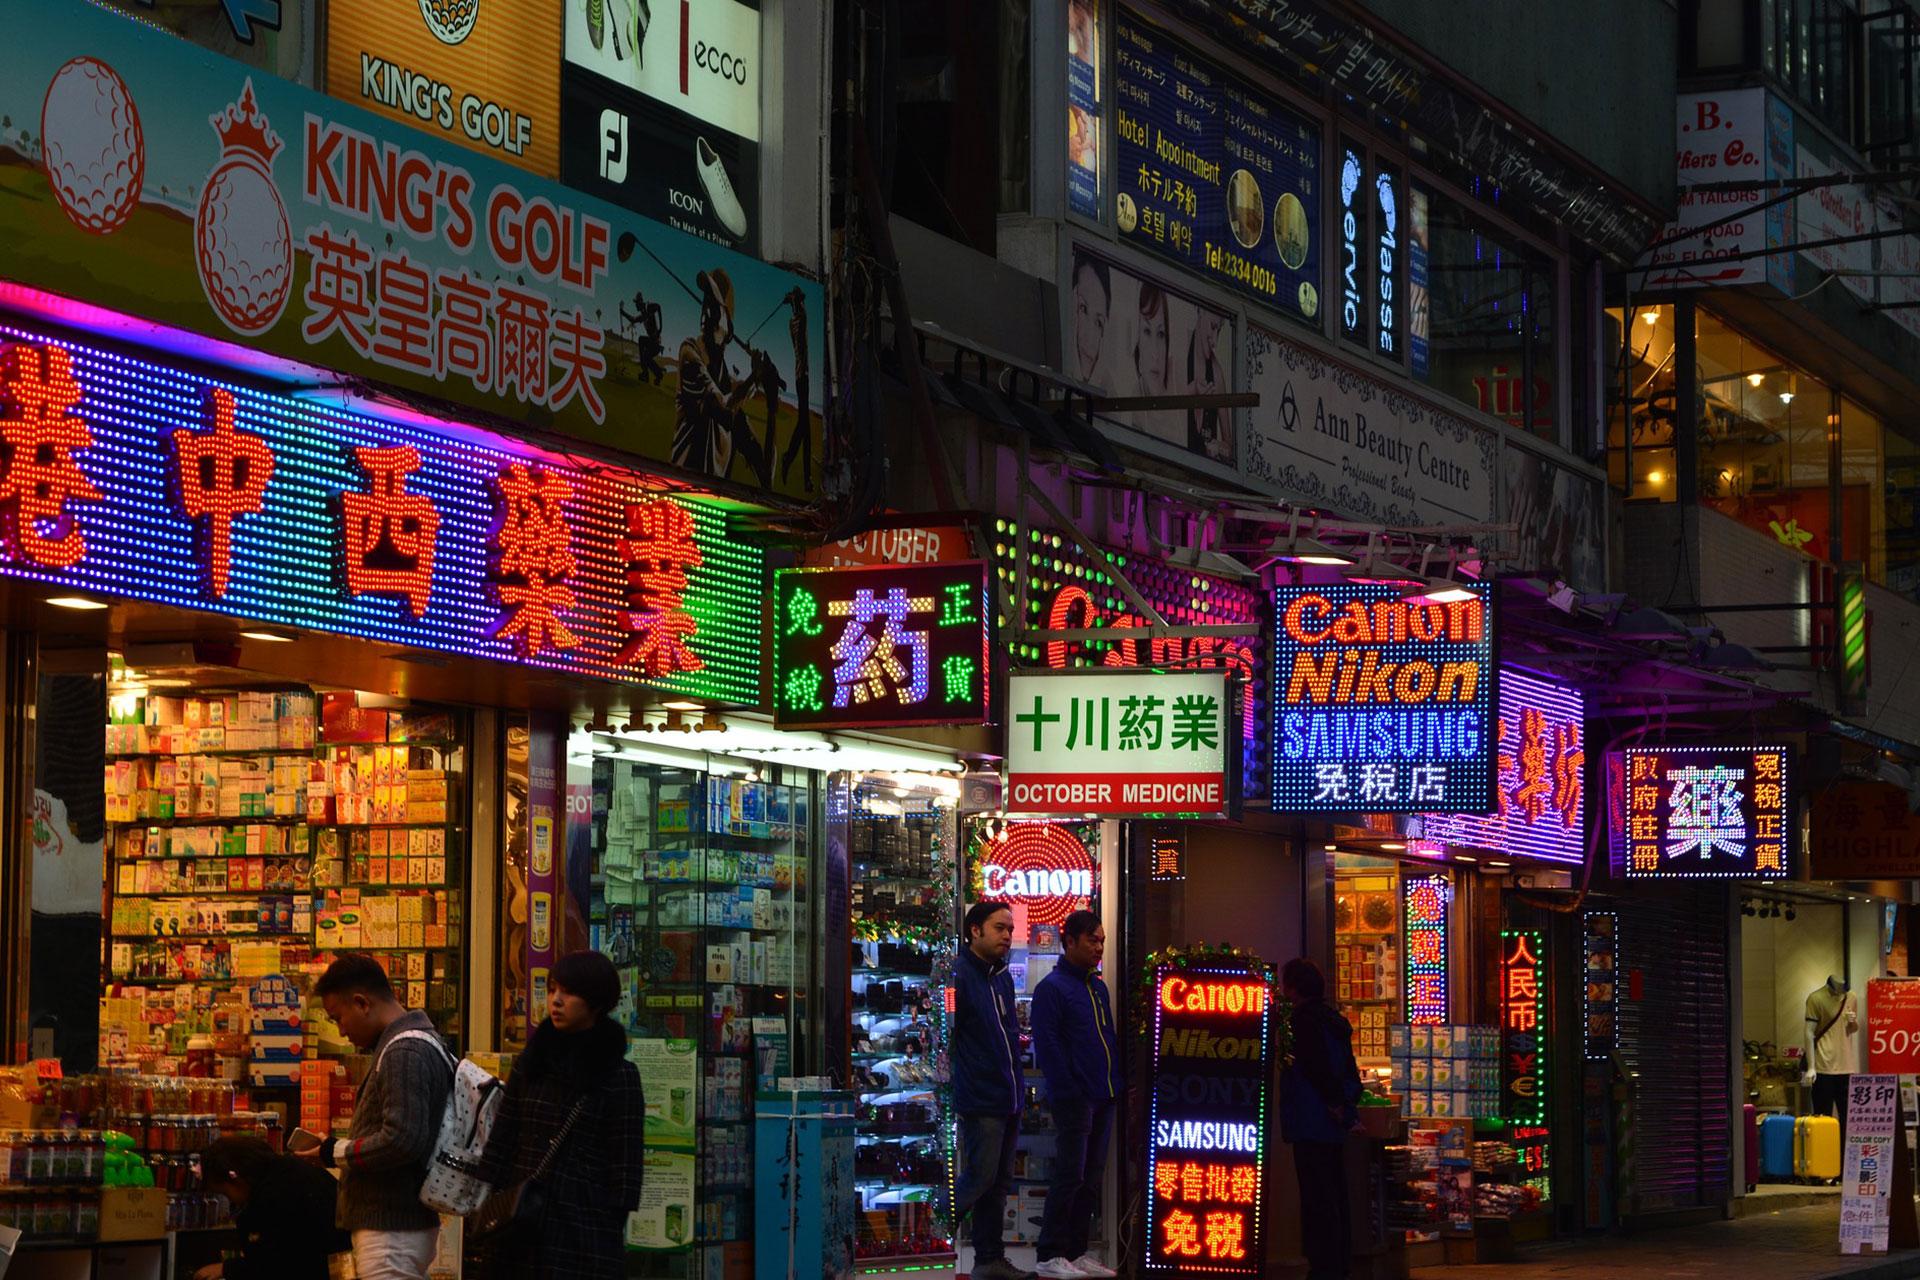 hongkong-gallery-3